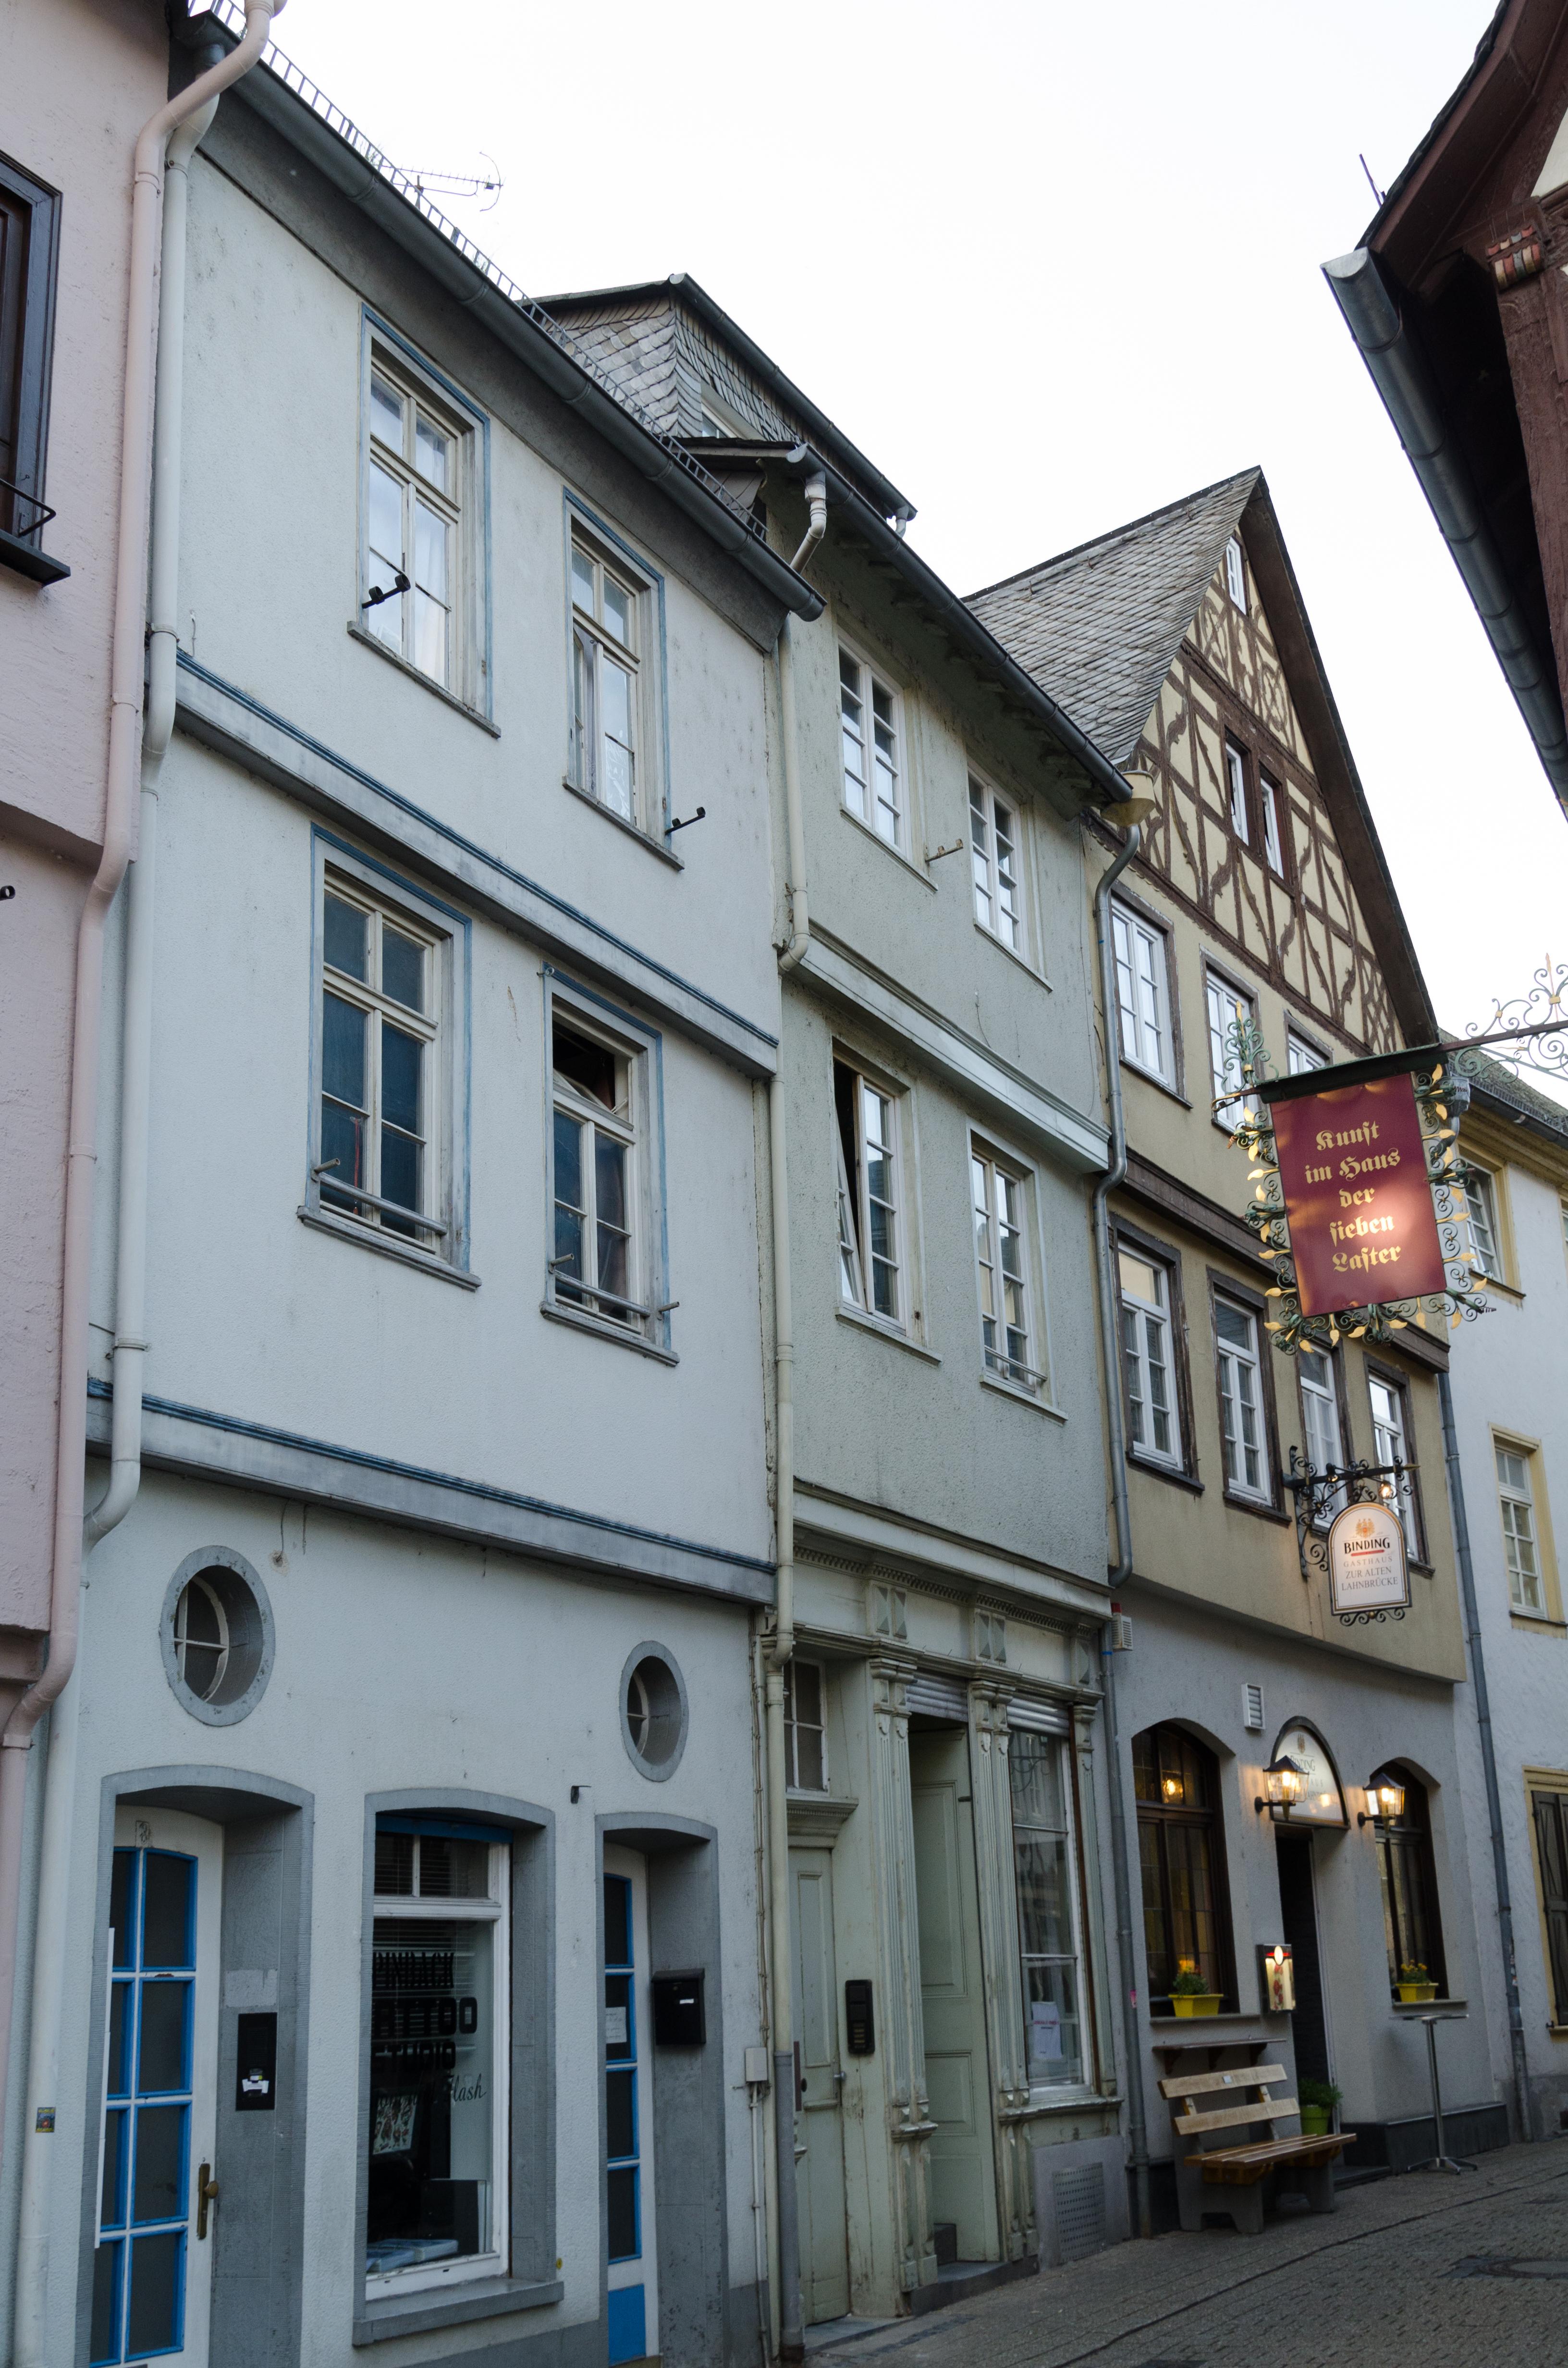 File:Limburg an der Lahn, Brückengasse 6, 001.jpg